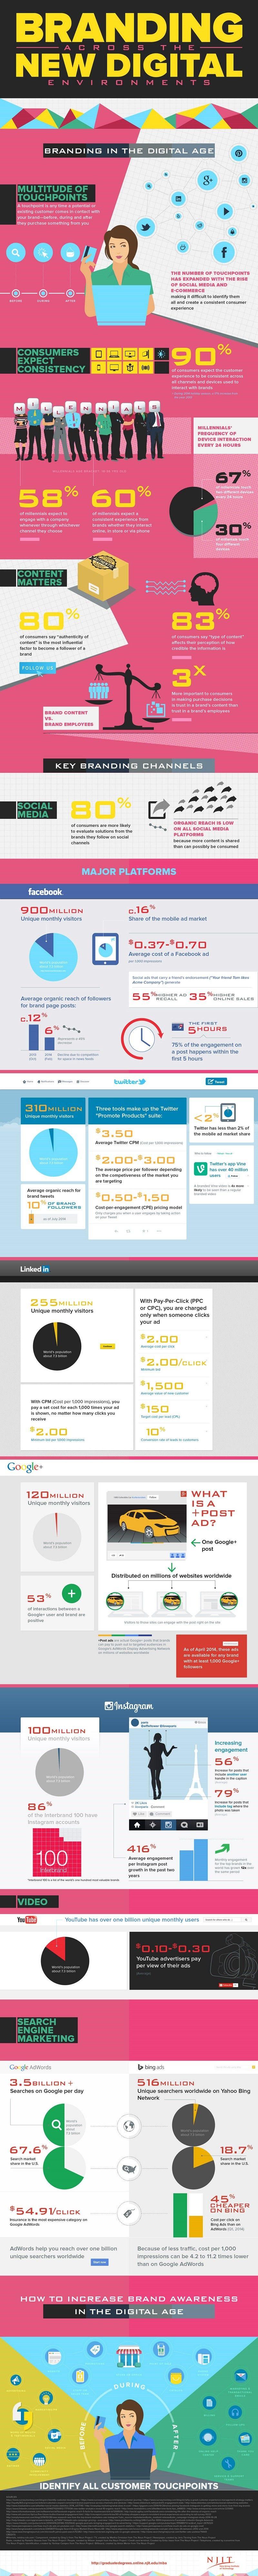 150929-brand-management-infographic